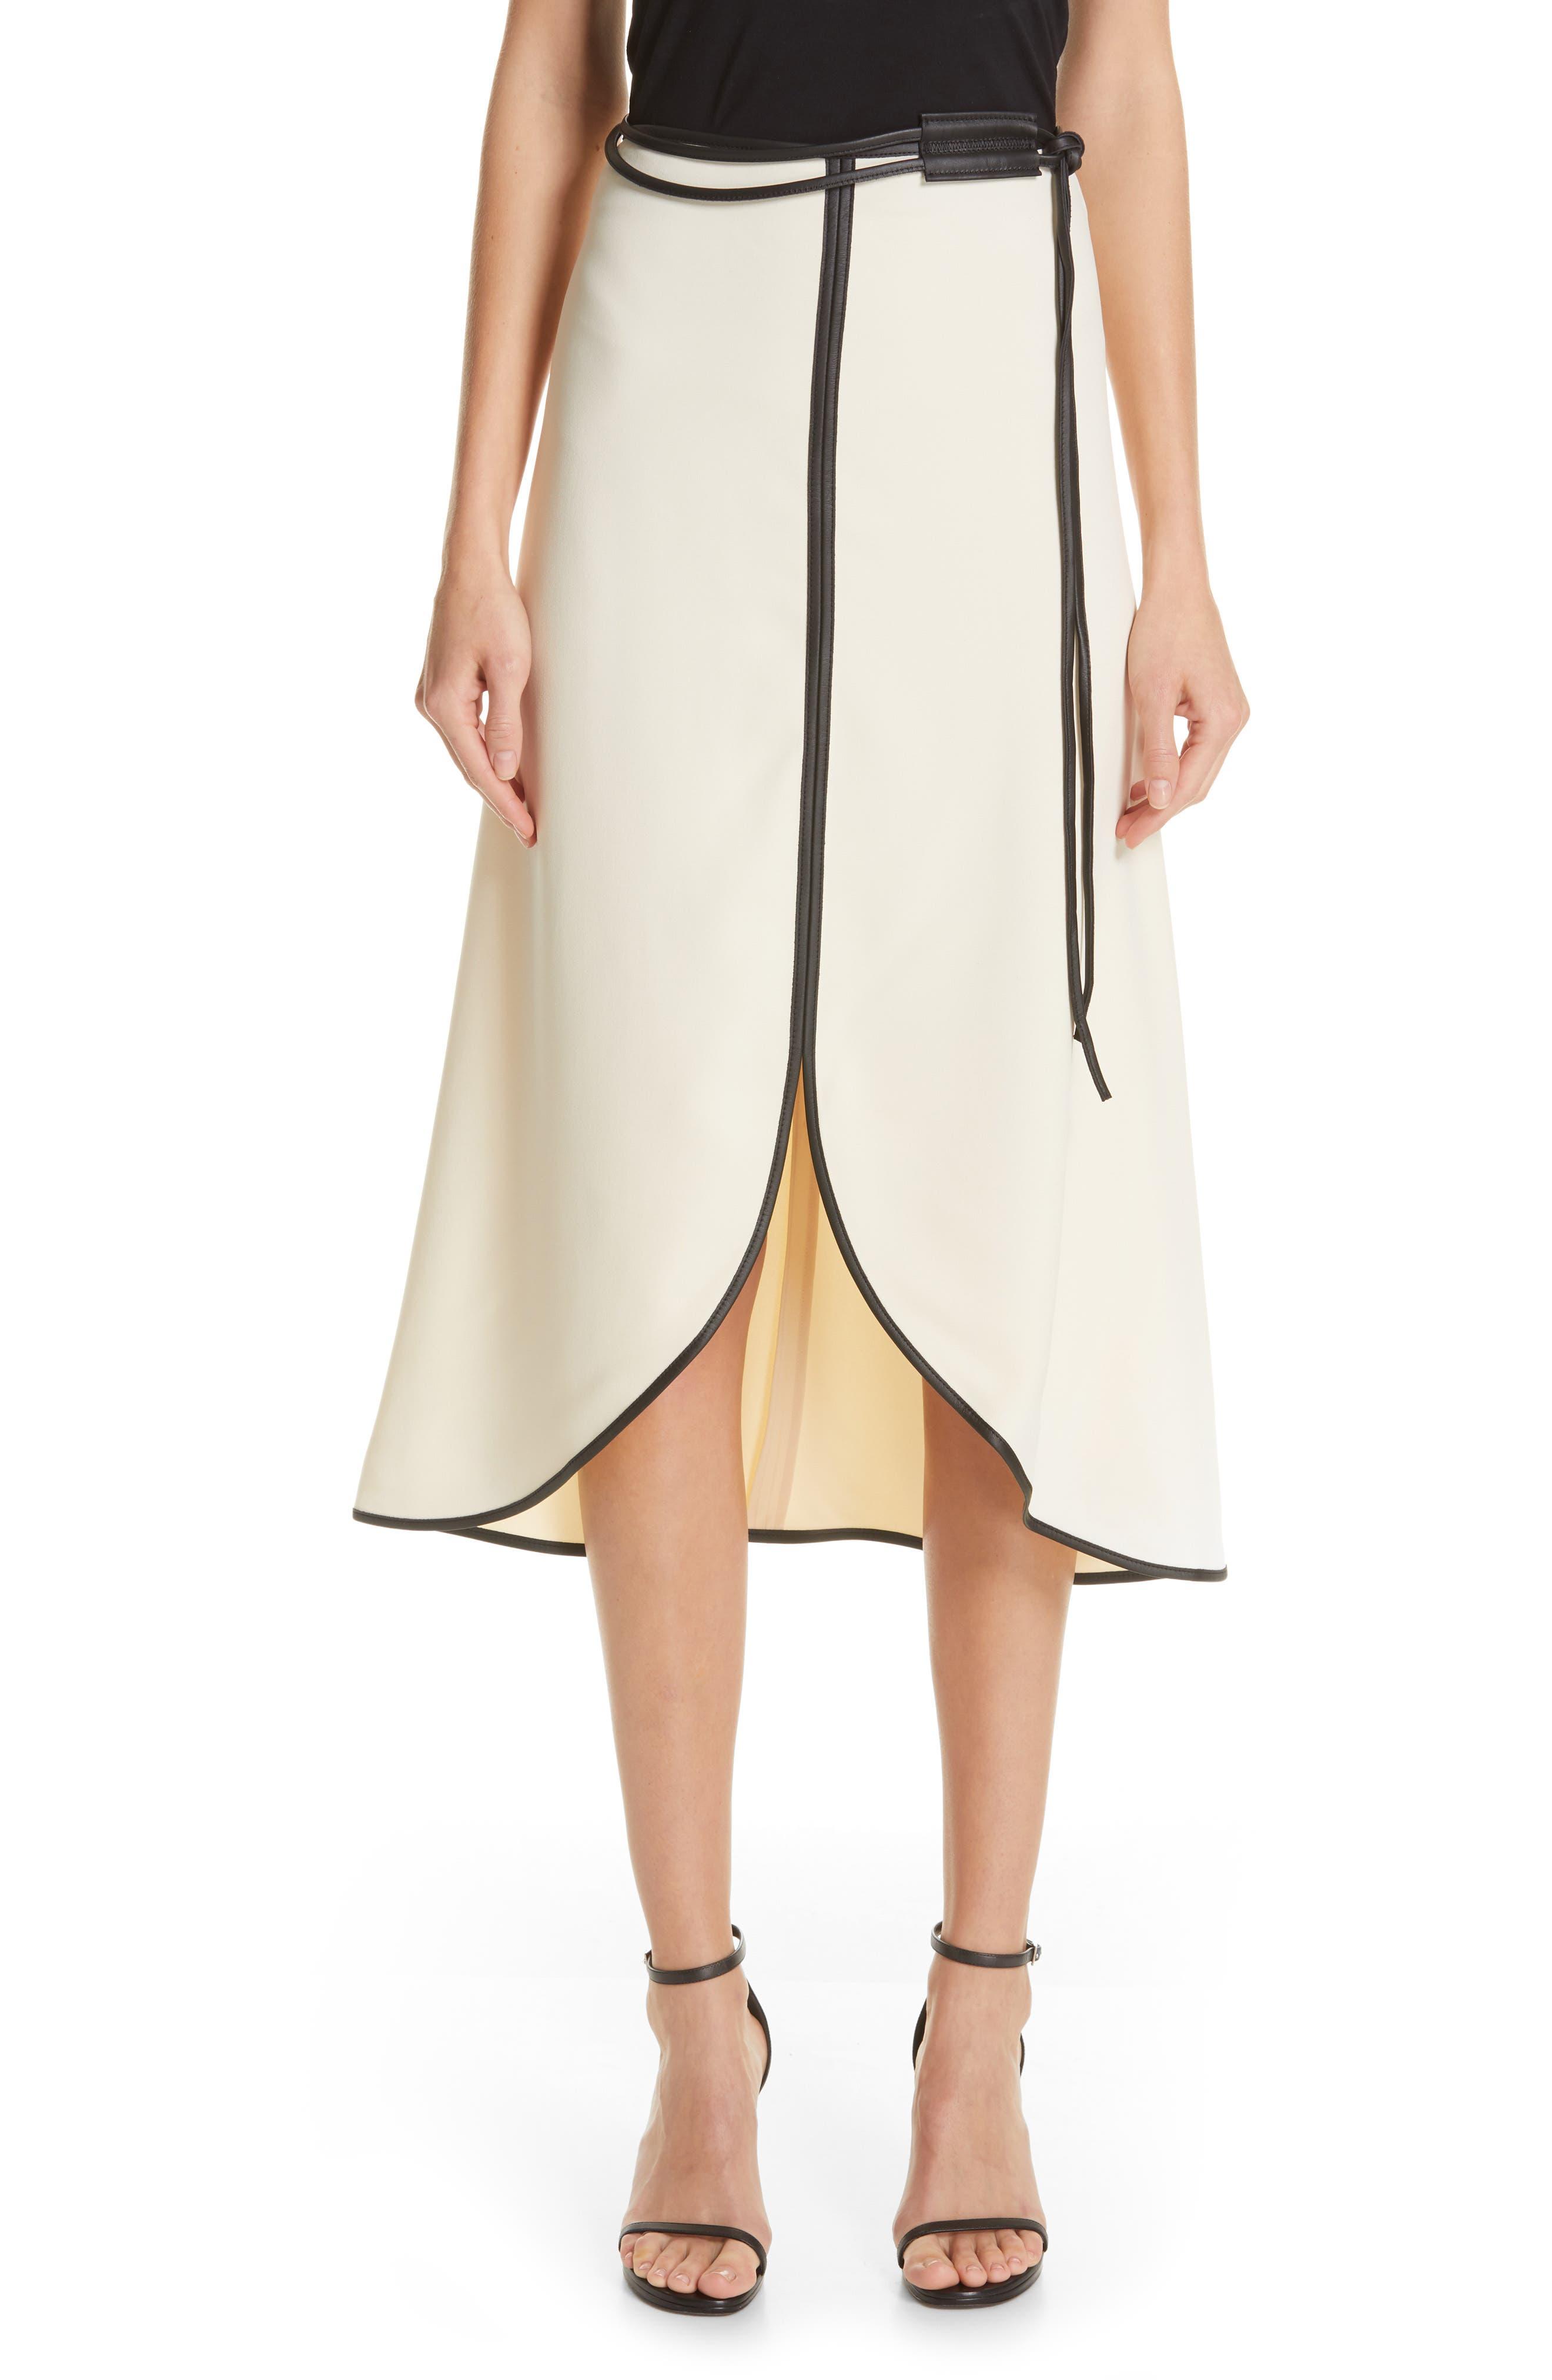 VICTORIA BECKHAM, Leather Trim Midi Skirt, Main thumbnail 1, color, MILK/ BLACK